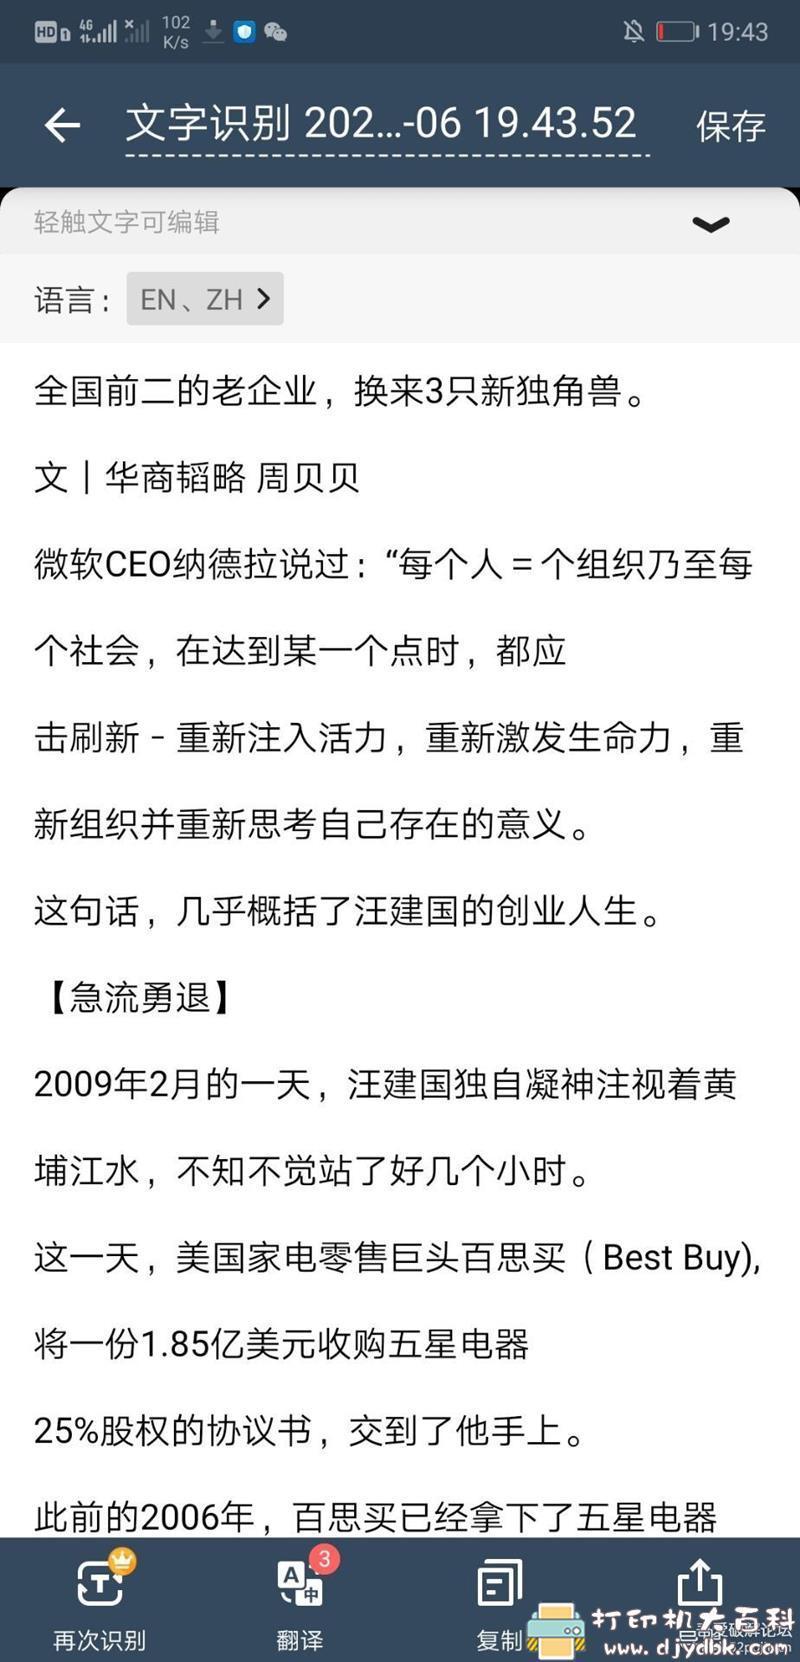 [Android]扫描全能王 v5.25 全功能版(ocr文字识别,证件照扫描) 配图 No.2